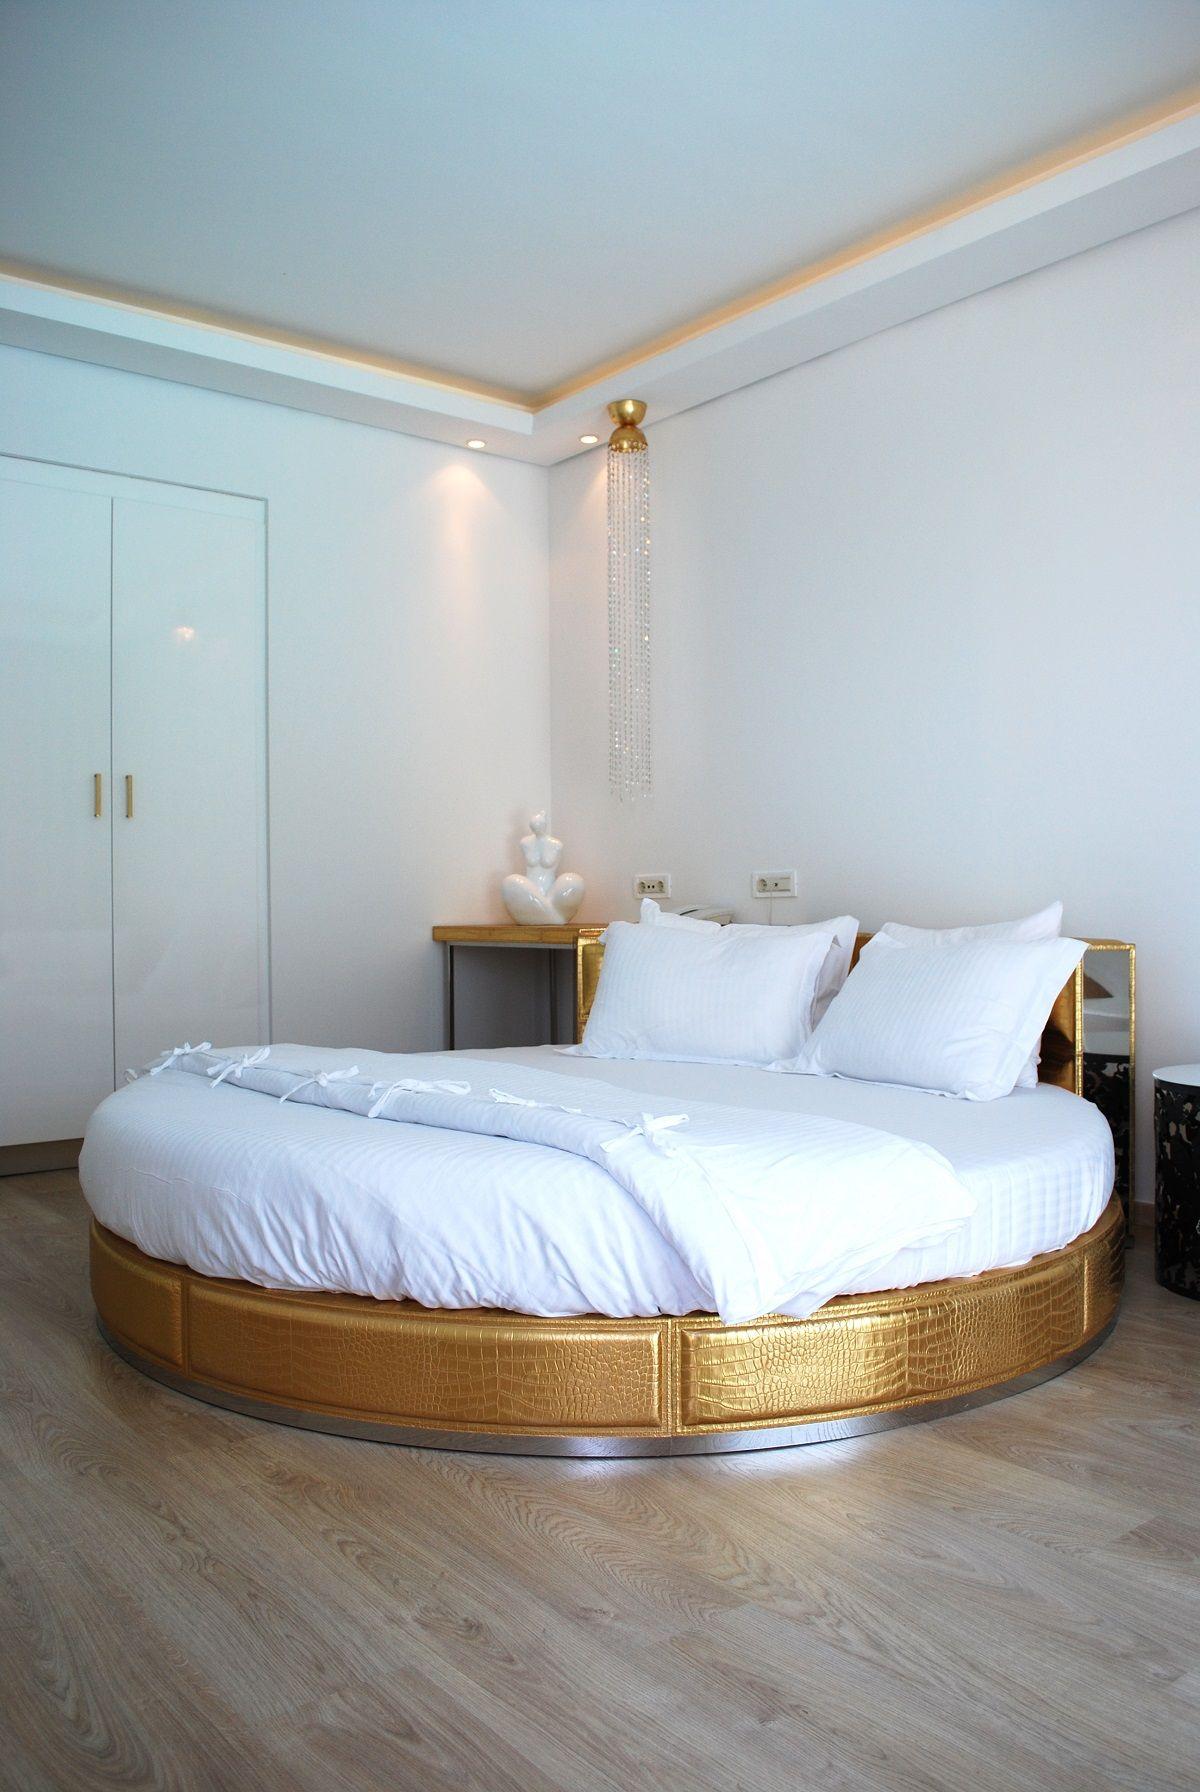 35 Best Modern Round Beds Design Ideas For Luxury Home Queen Loft Beds Bed Design Luxurious Bedrooms